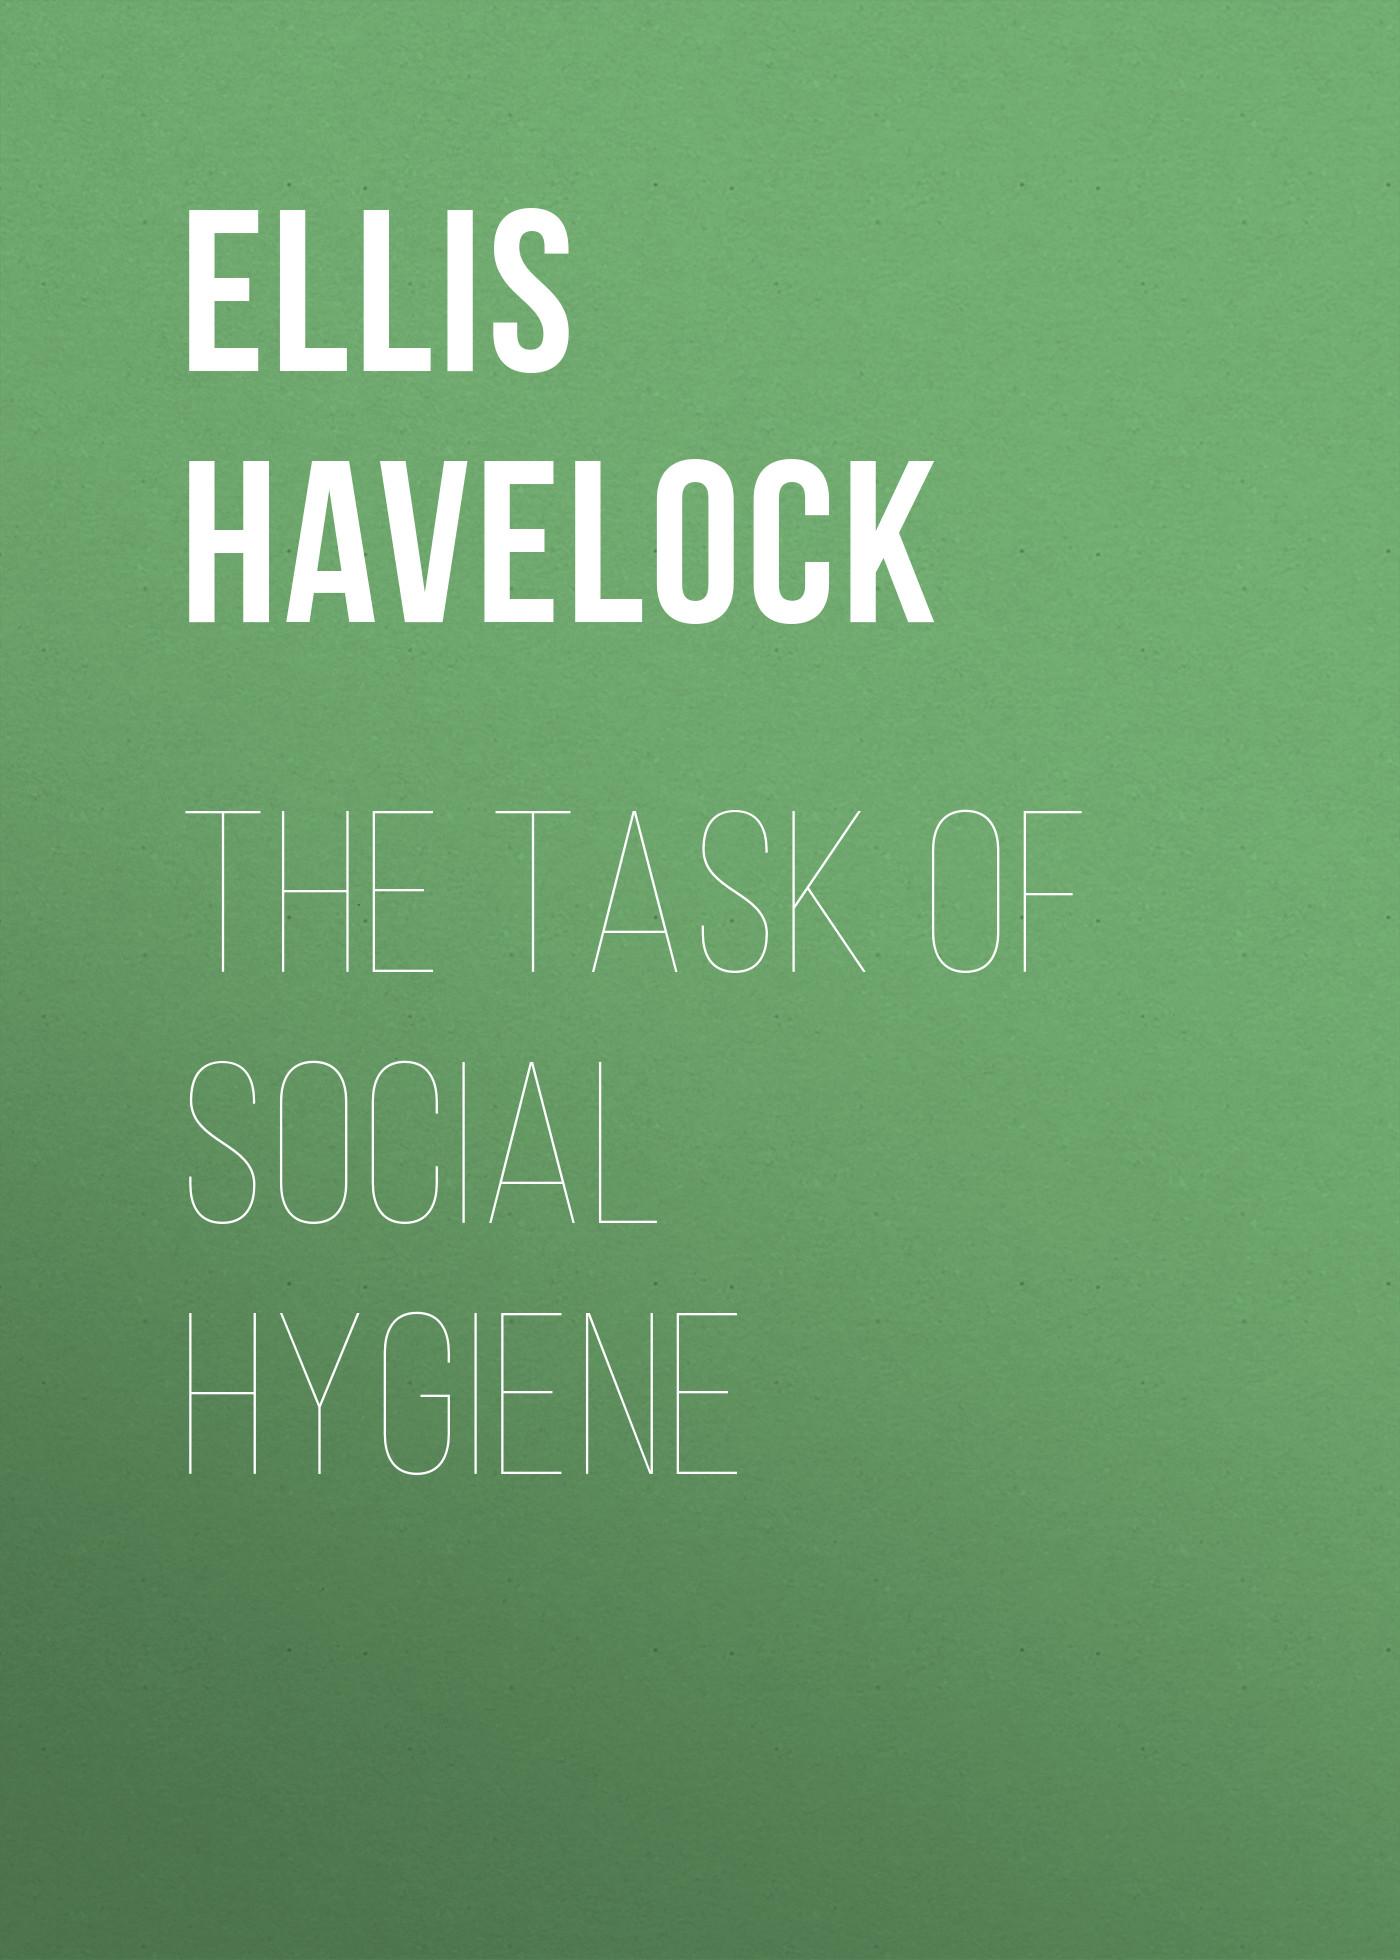 Ellis Havelock The Task of Social Hygiene